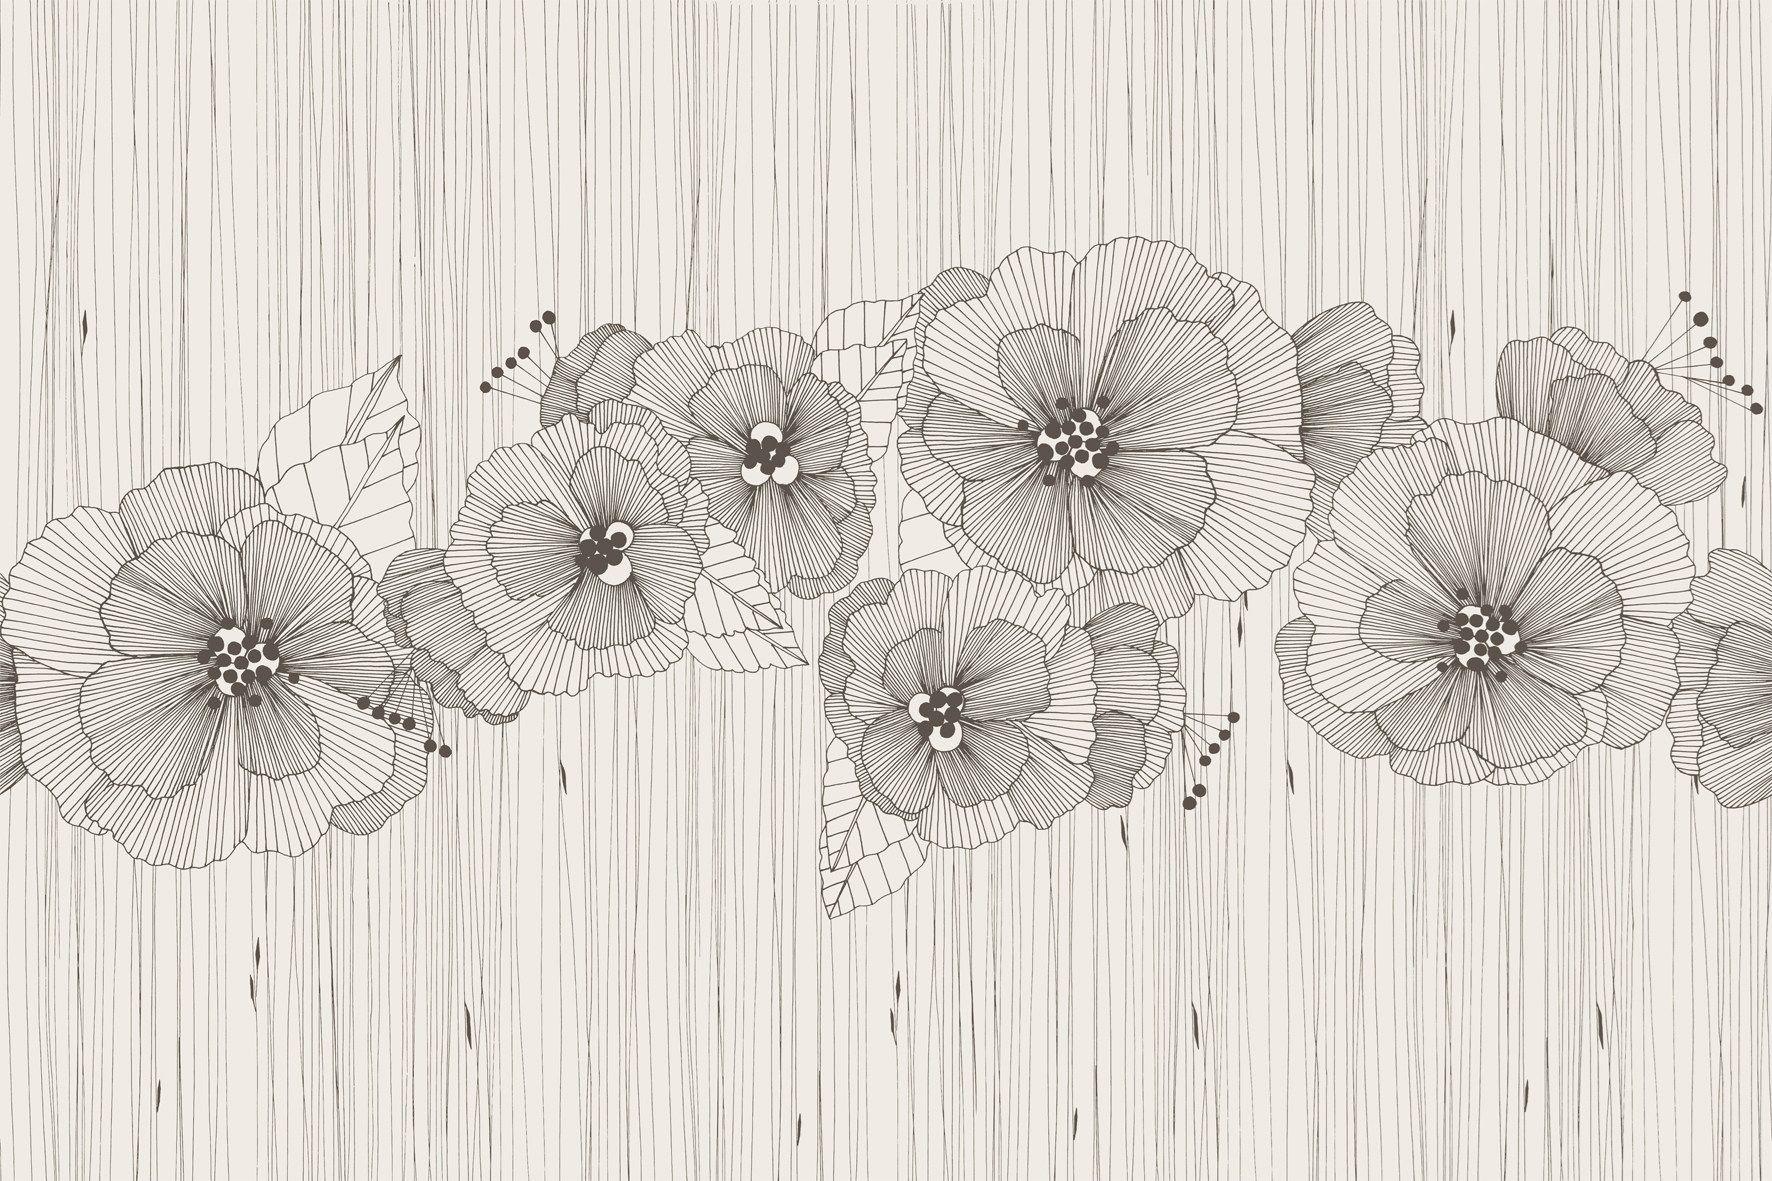 Papel pintado de vinilo de flores manhattan by glamora - Papel de vinilo ...